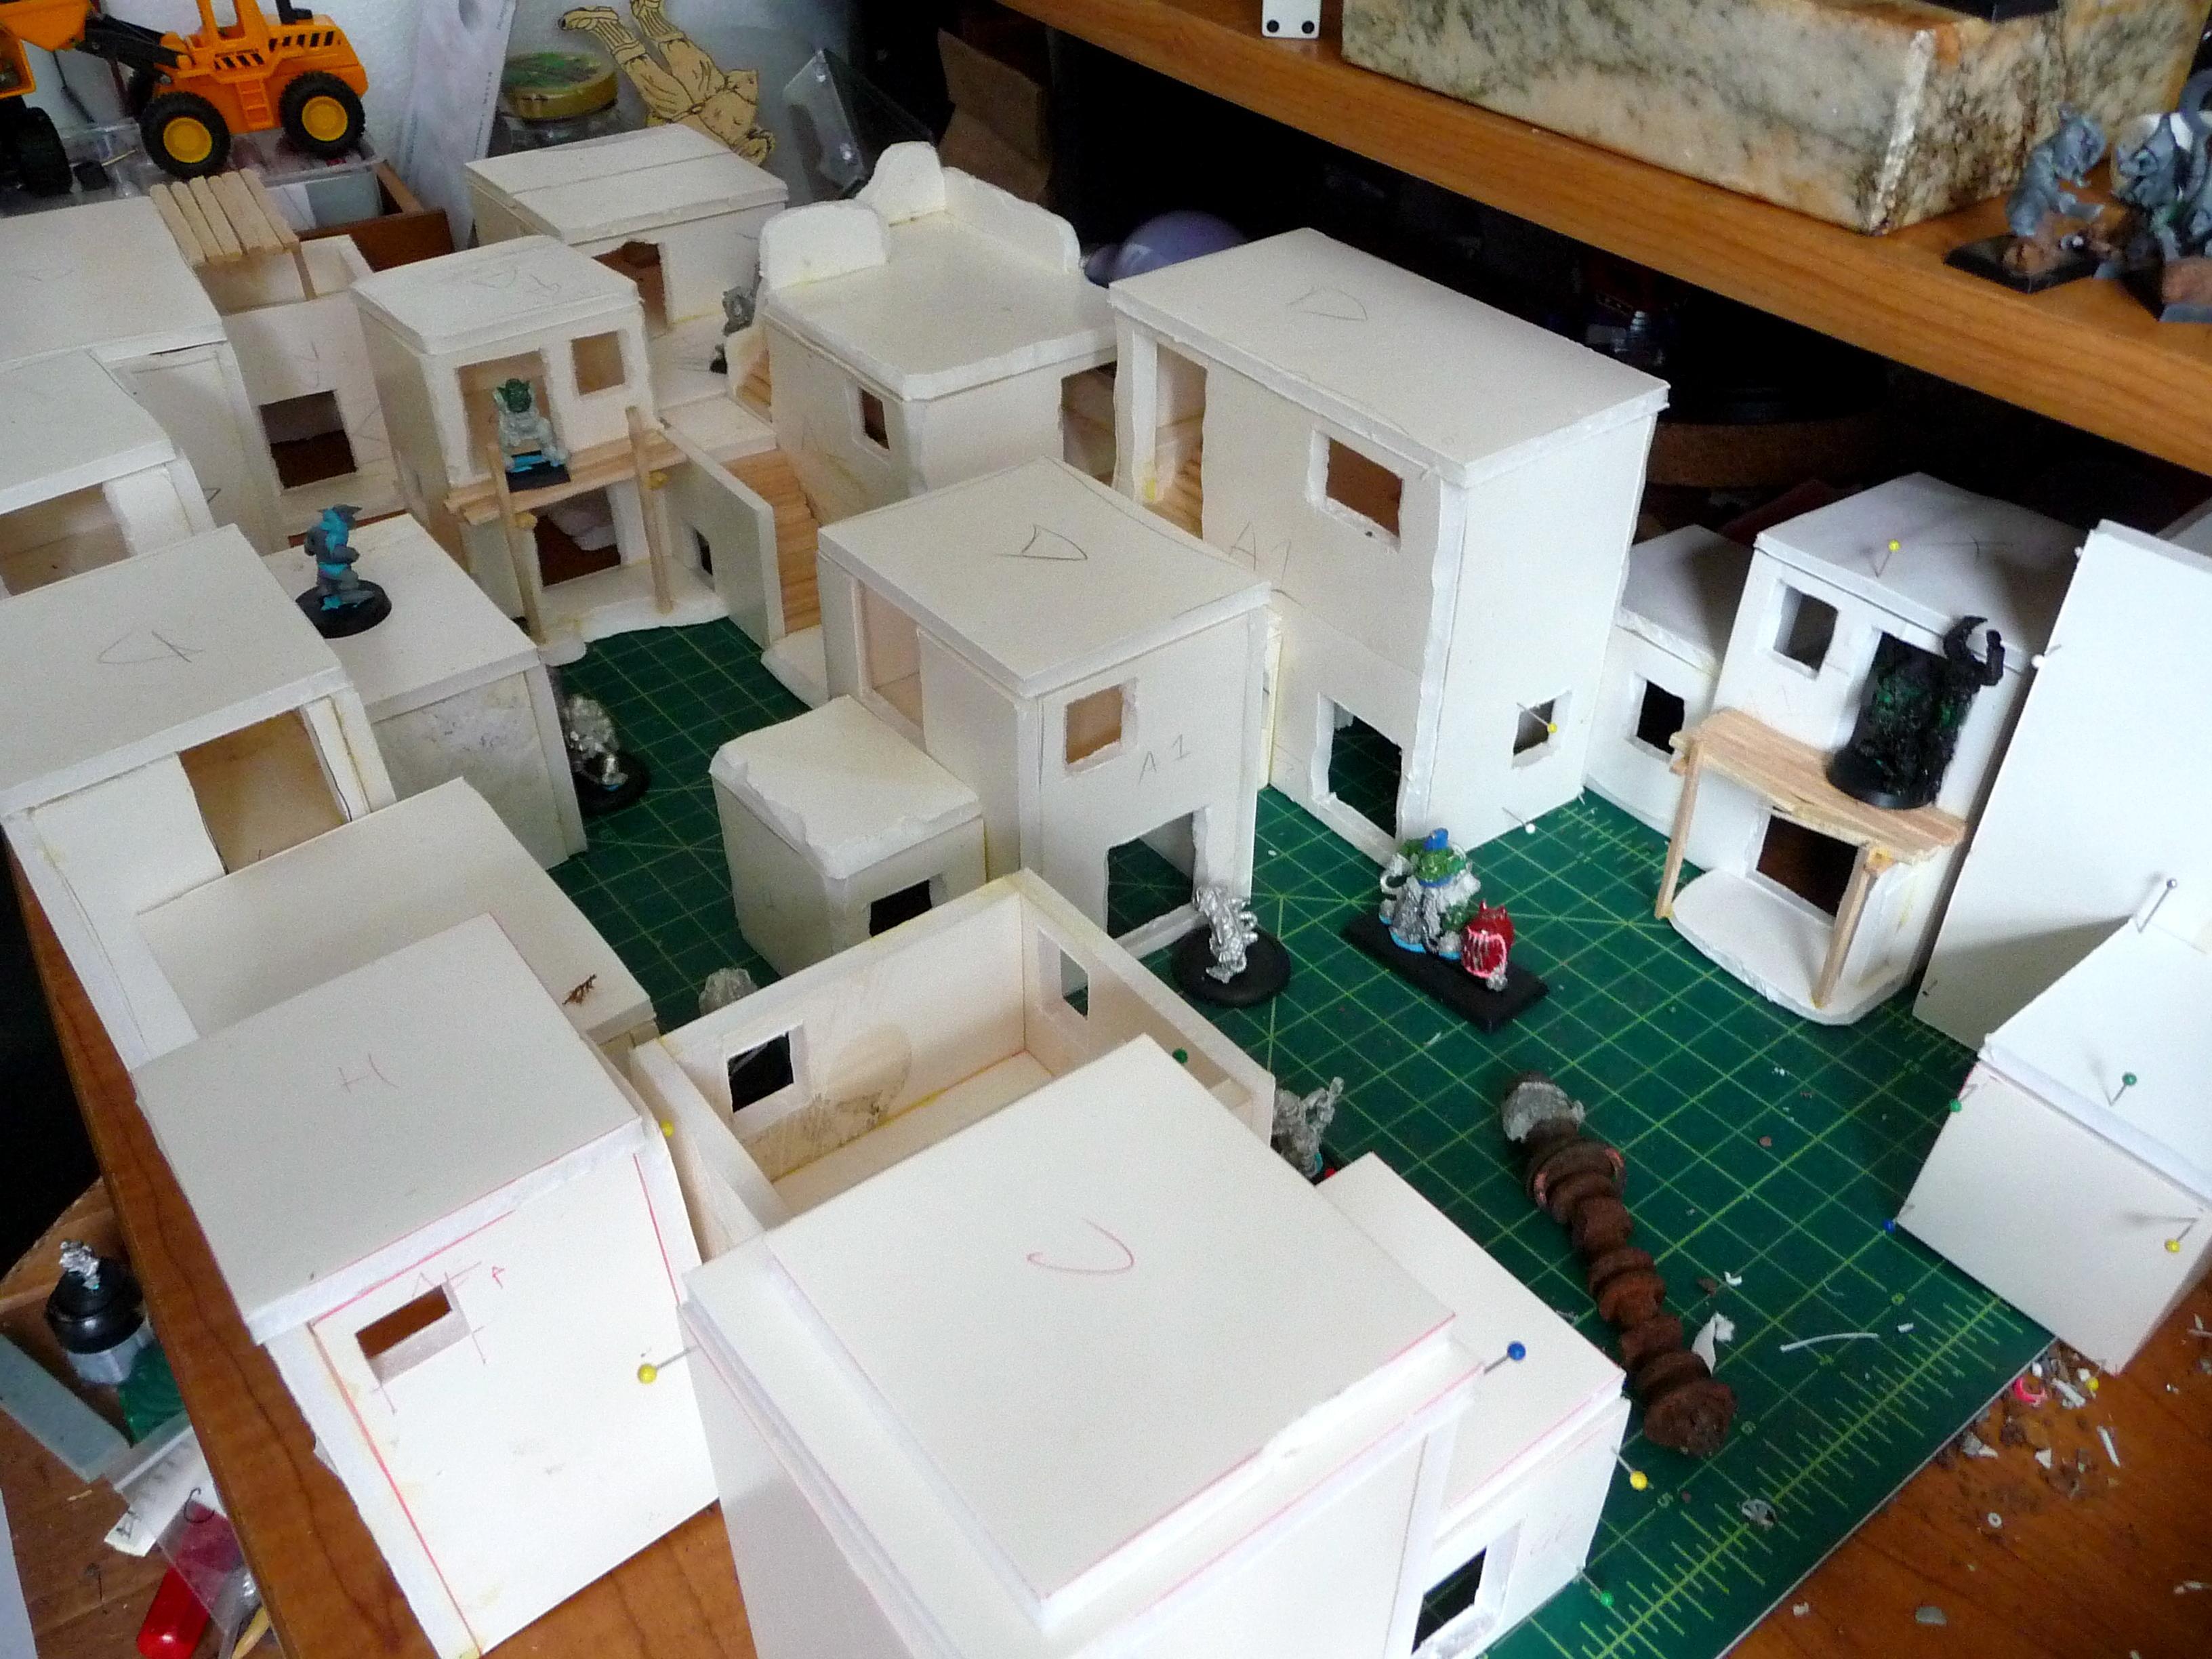 Buildings, City, Foamcore, Orks, Terrain, Town